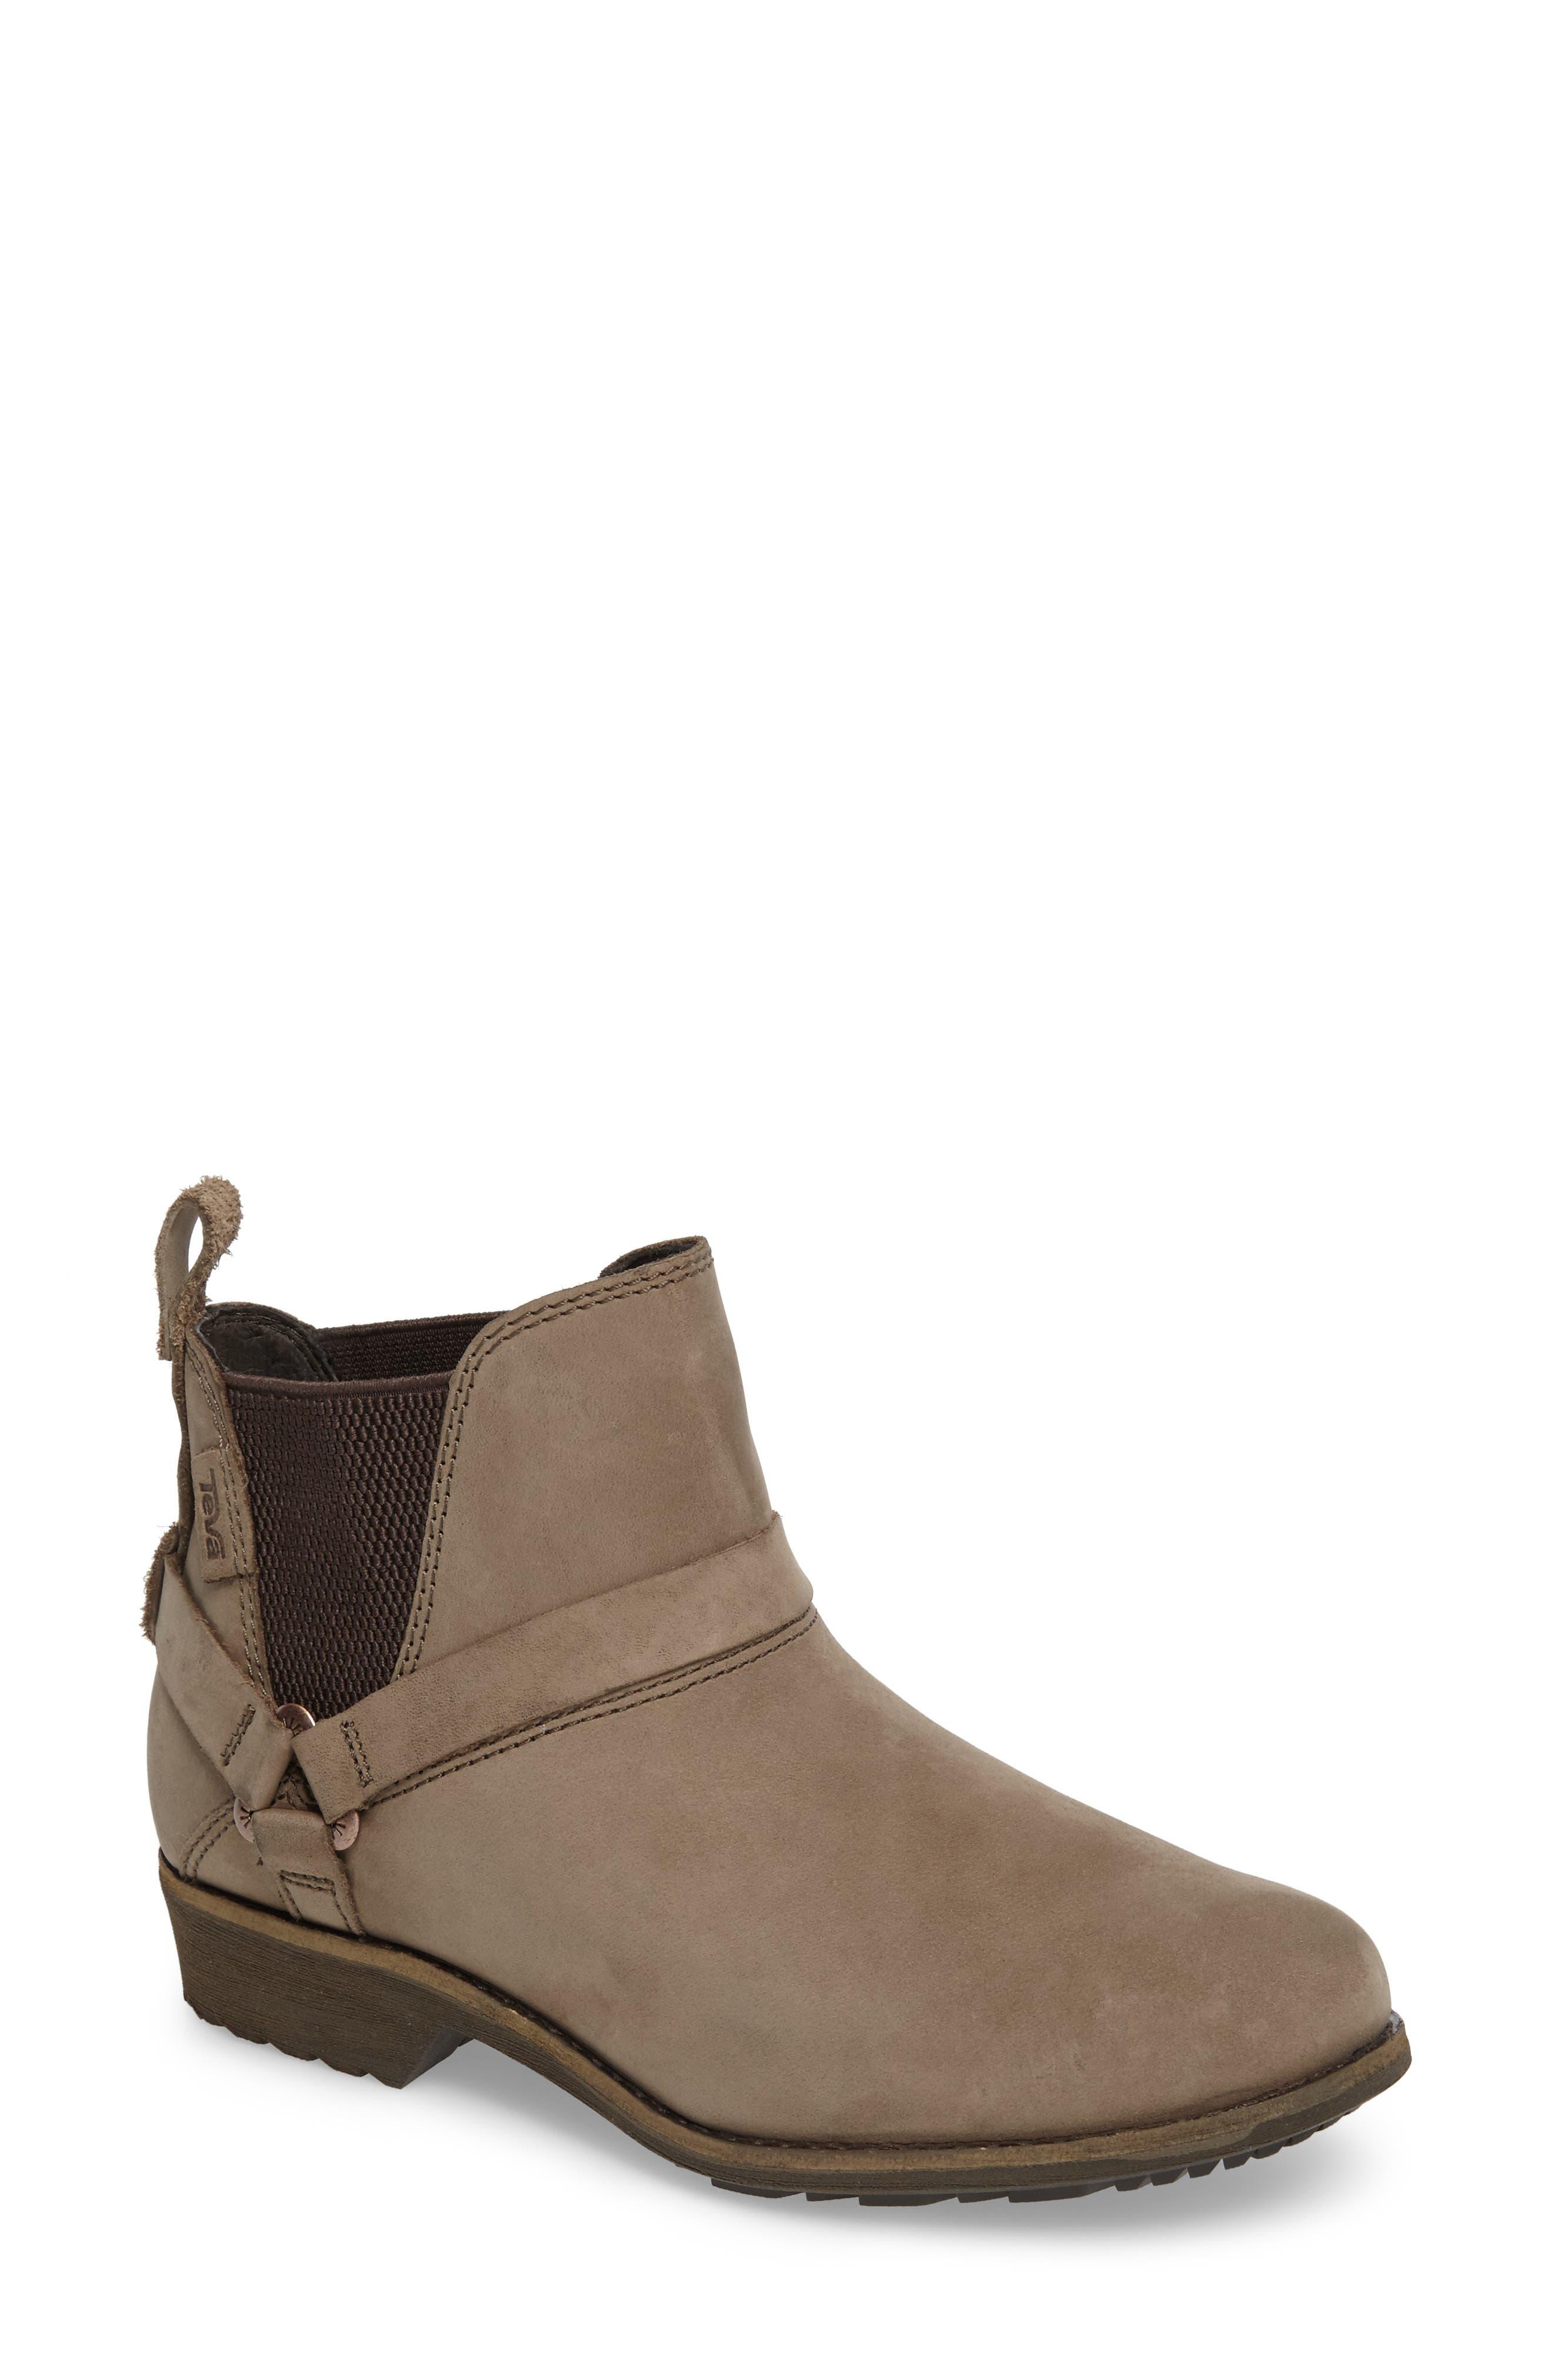 Dina La Vina Dos Waterproof Chelsea Boot,                             Main thumbnail 1, color,                             Bungee Cord Leather